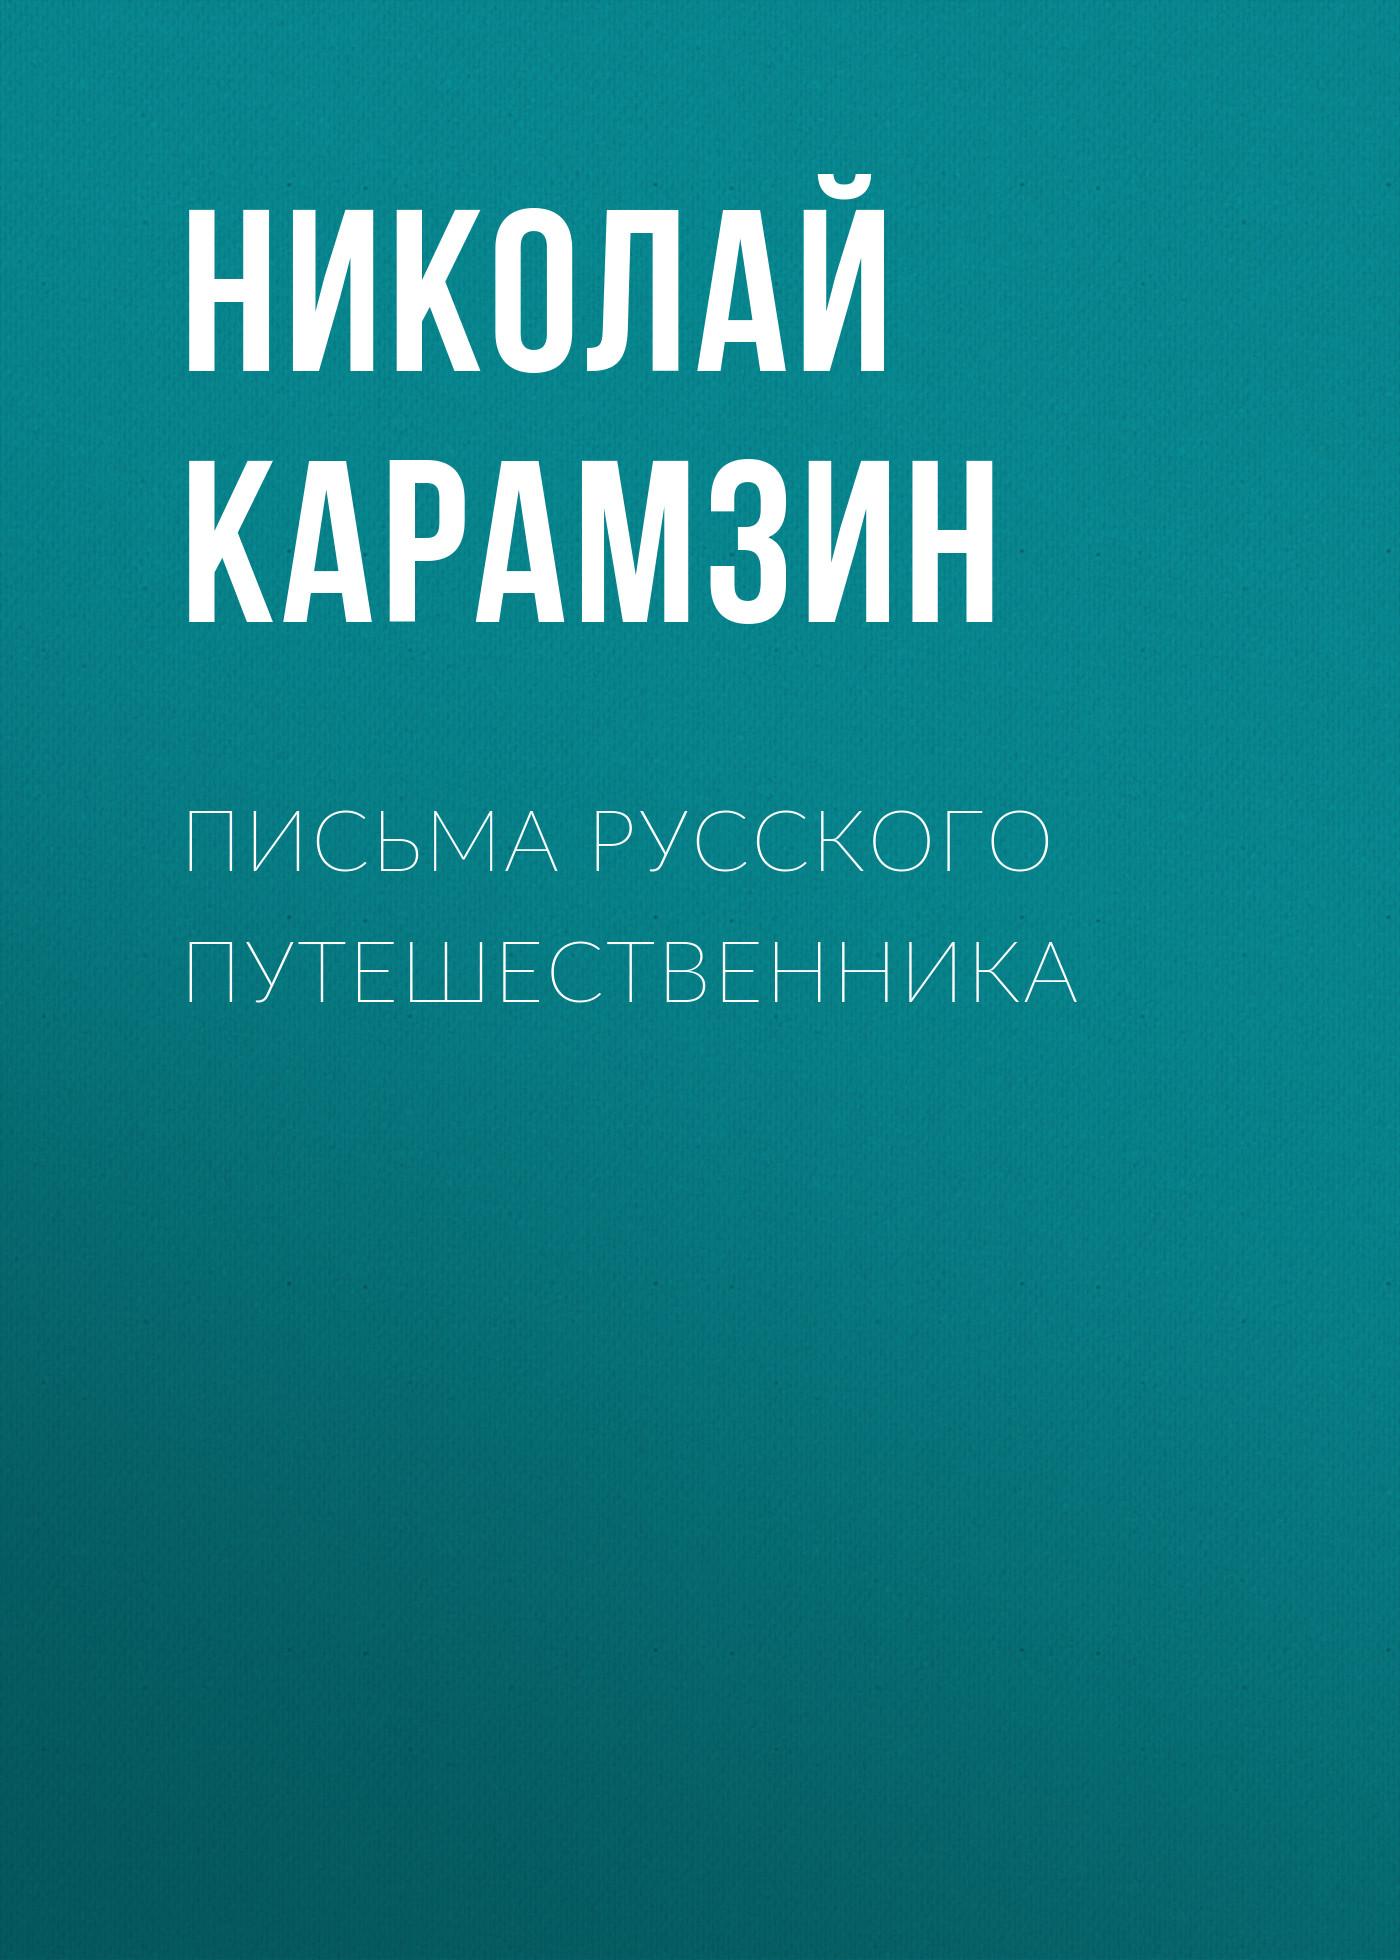 Николай Карамзин Письма русского путешественника цены онлайн